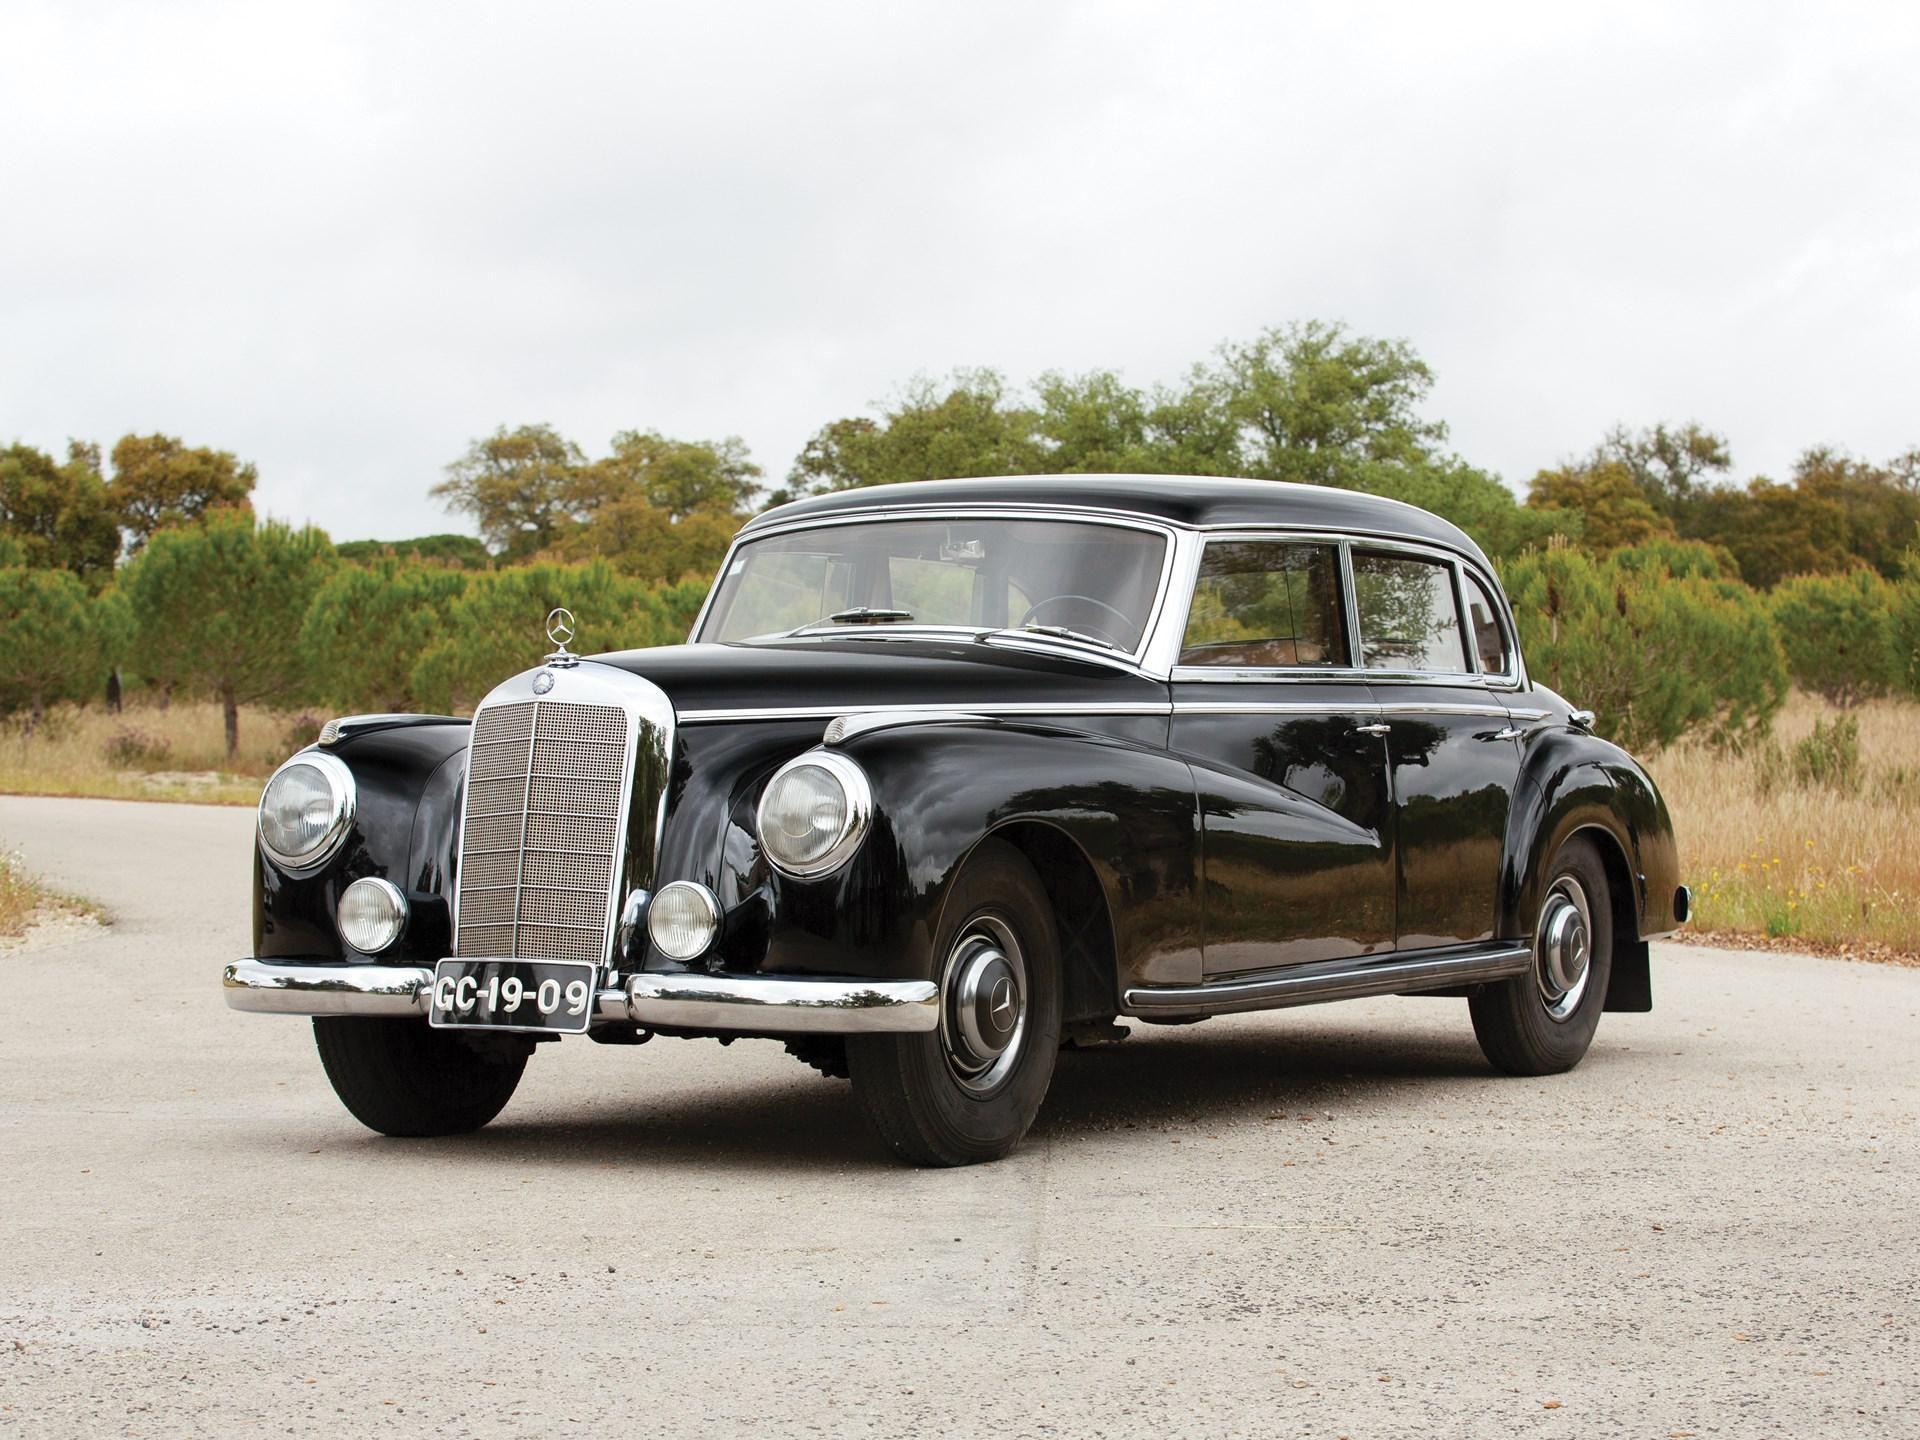 1952 Mercedes-Benz 300 Sedan